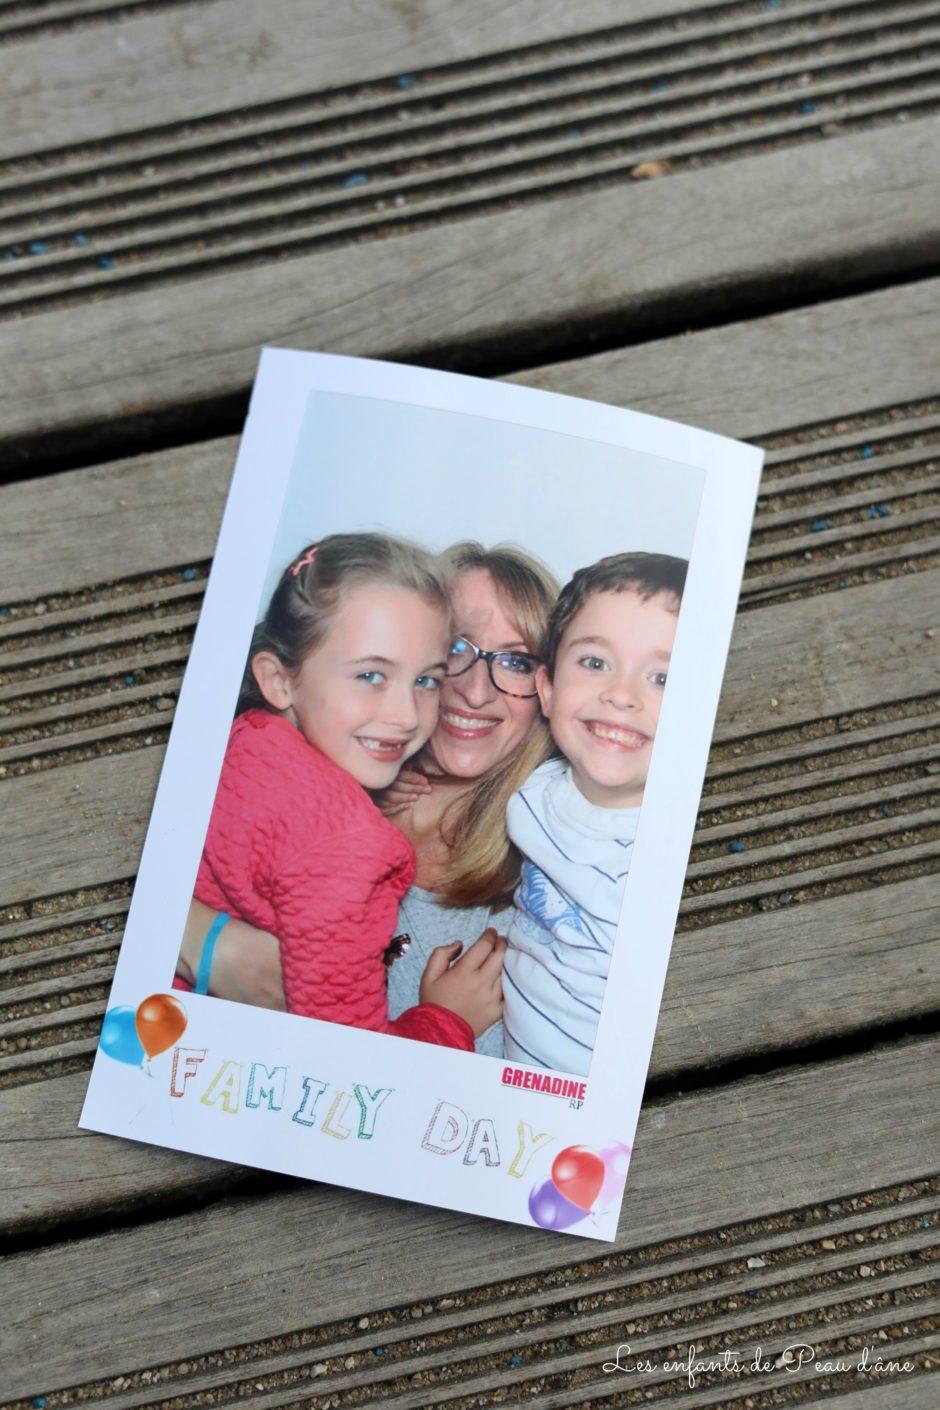 Family Day Photo souvenir